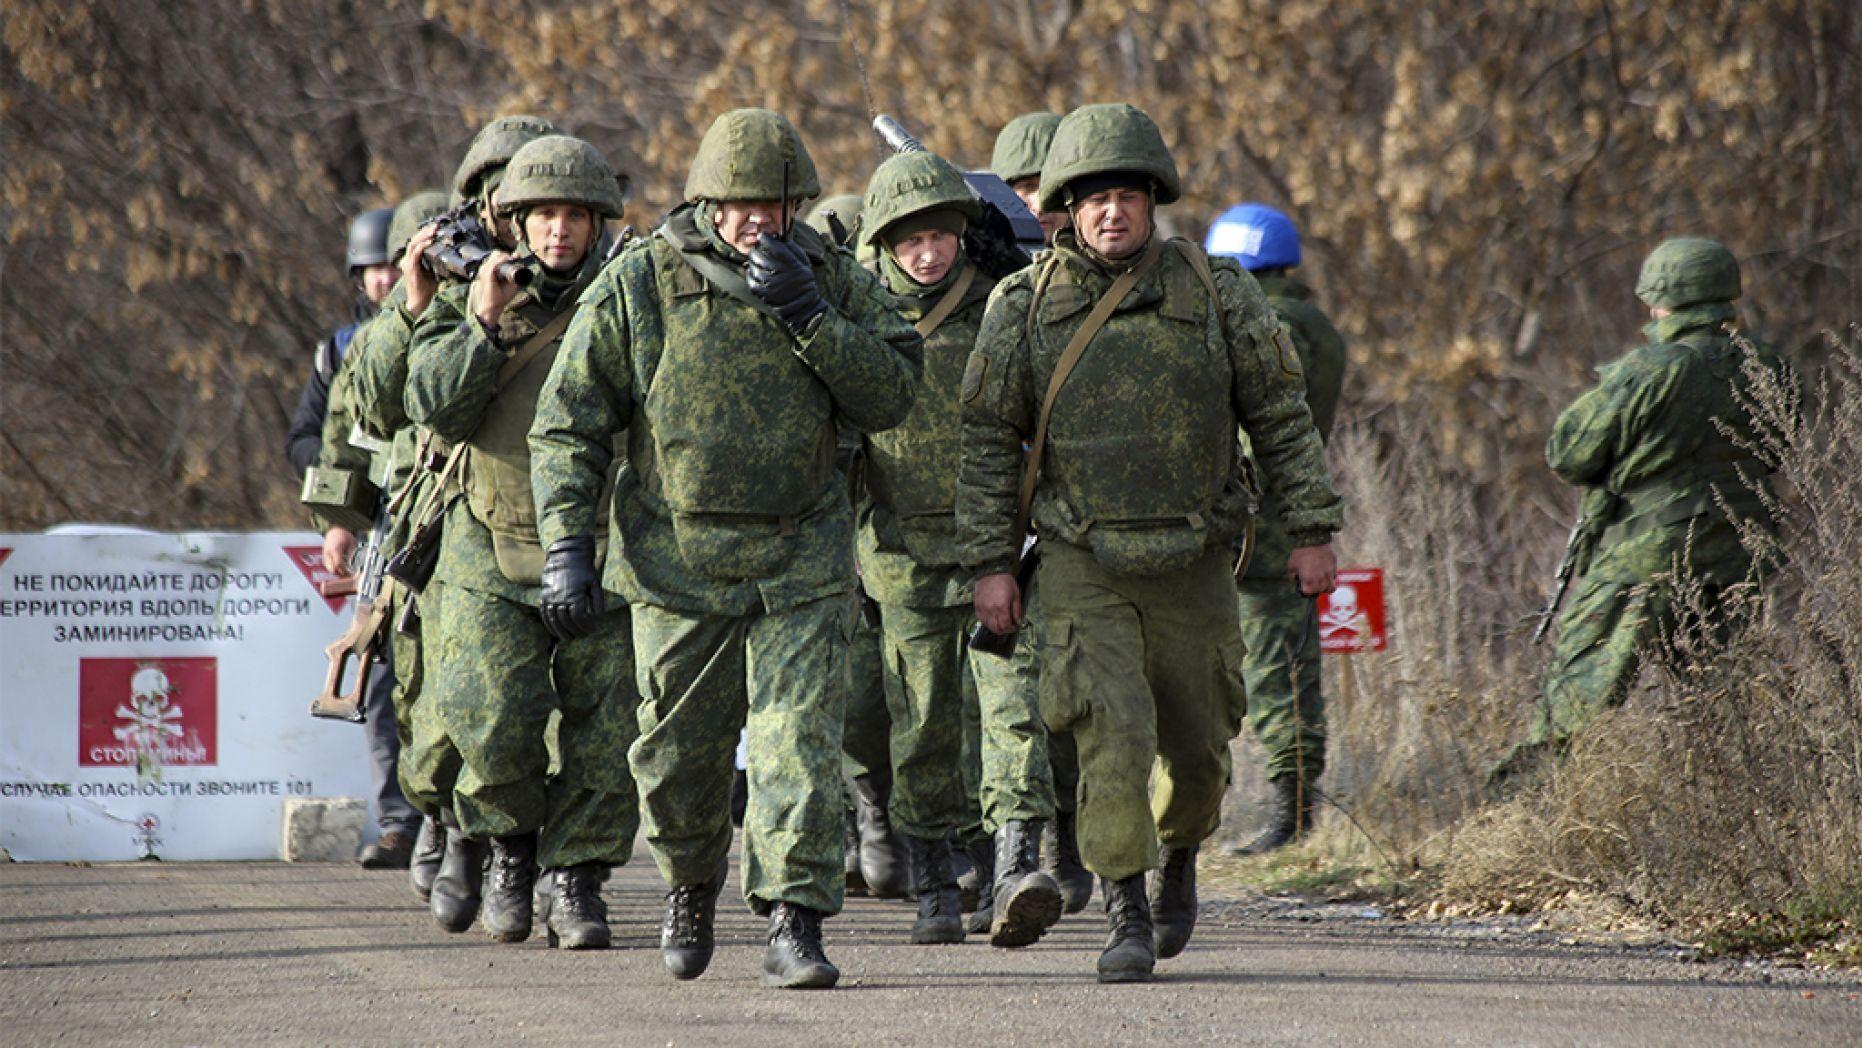 Ukrainian forces, Russian-backed separatists begin pullback in war-torn Donbass